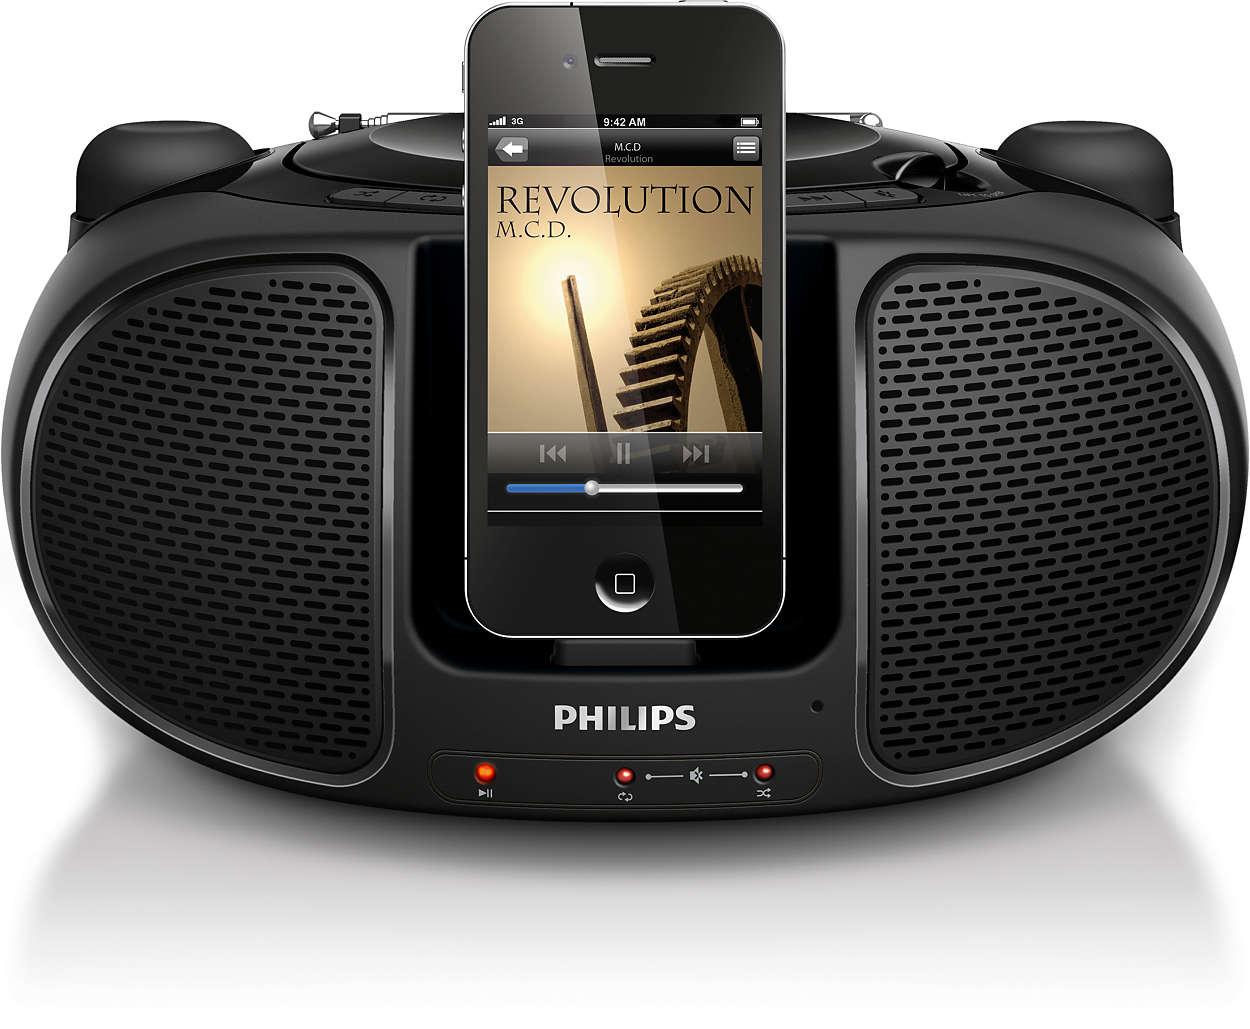 Desfrute da música do seu iPod/iPhone onde quer que esteja